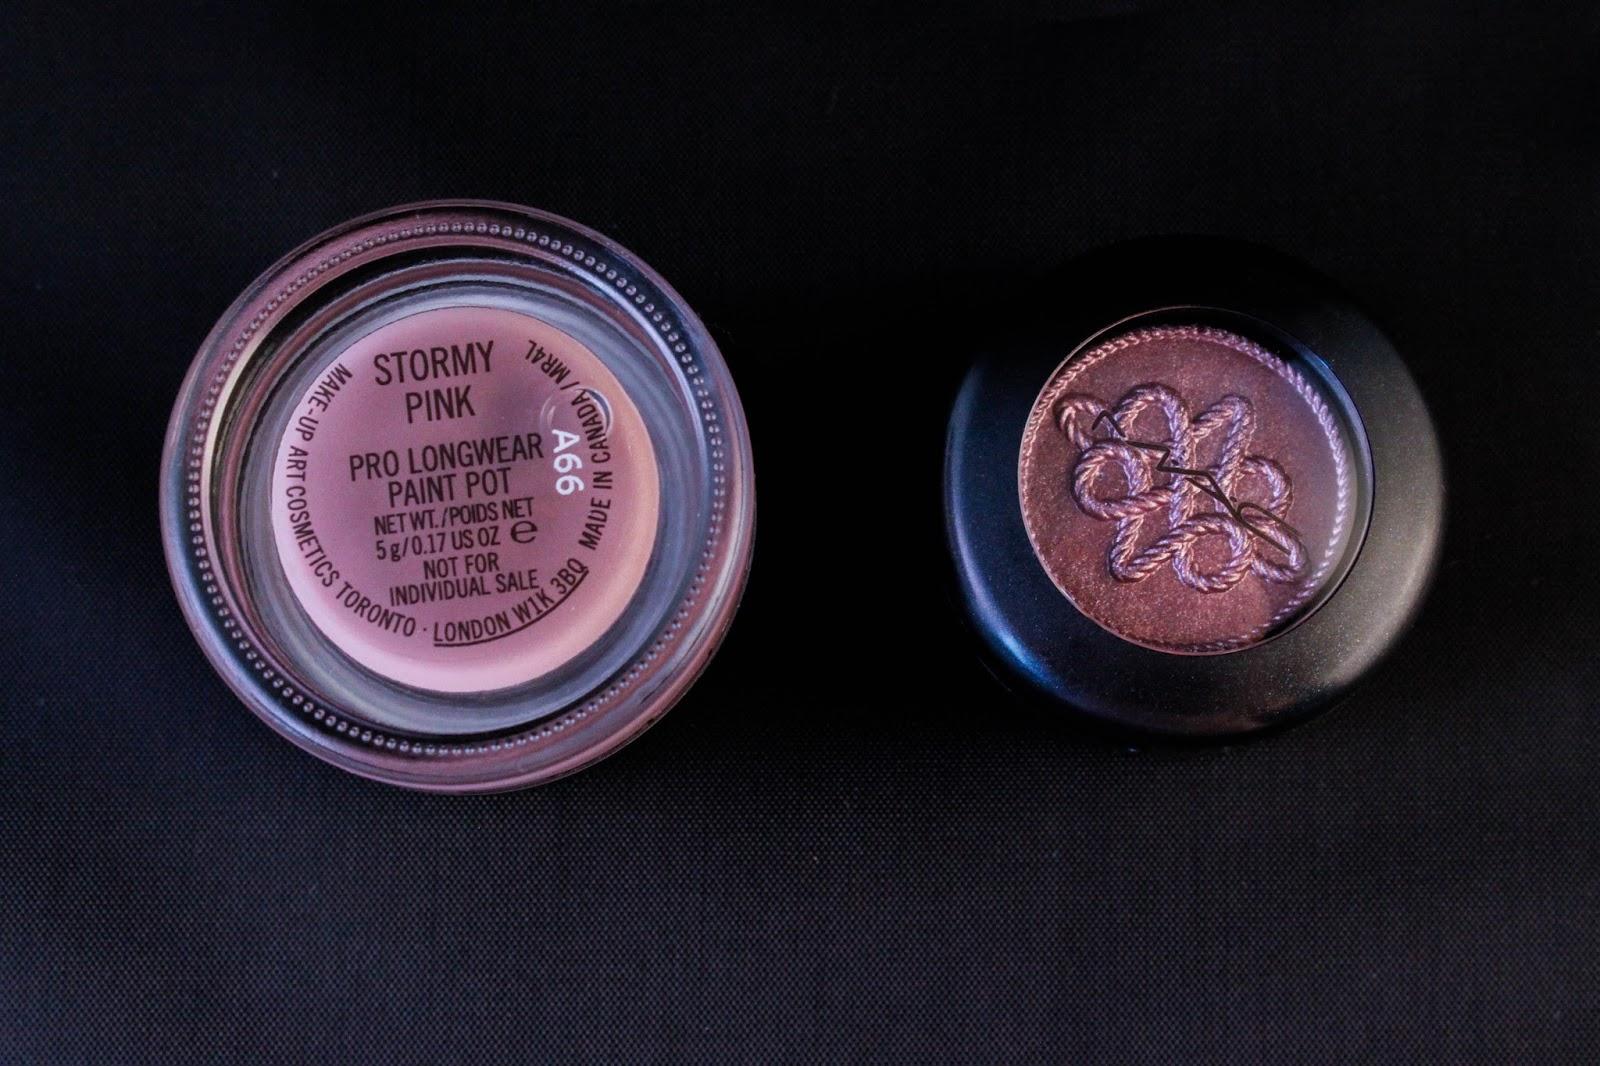 stormy pink smoky mauve MAC nutcracker sweet plum eye bag christmas 2016 noel paint pot eyeshadow technakhol mascara purple